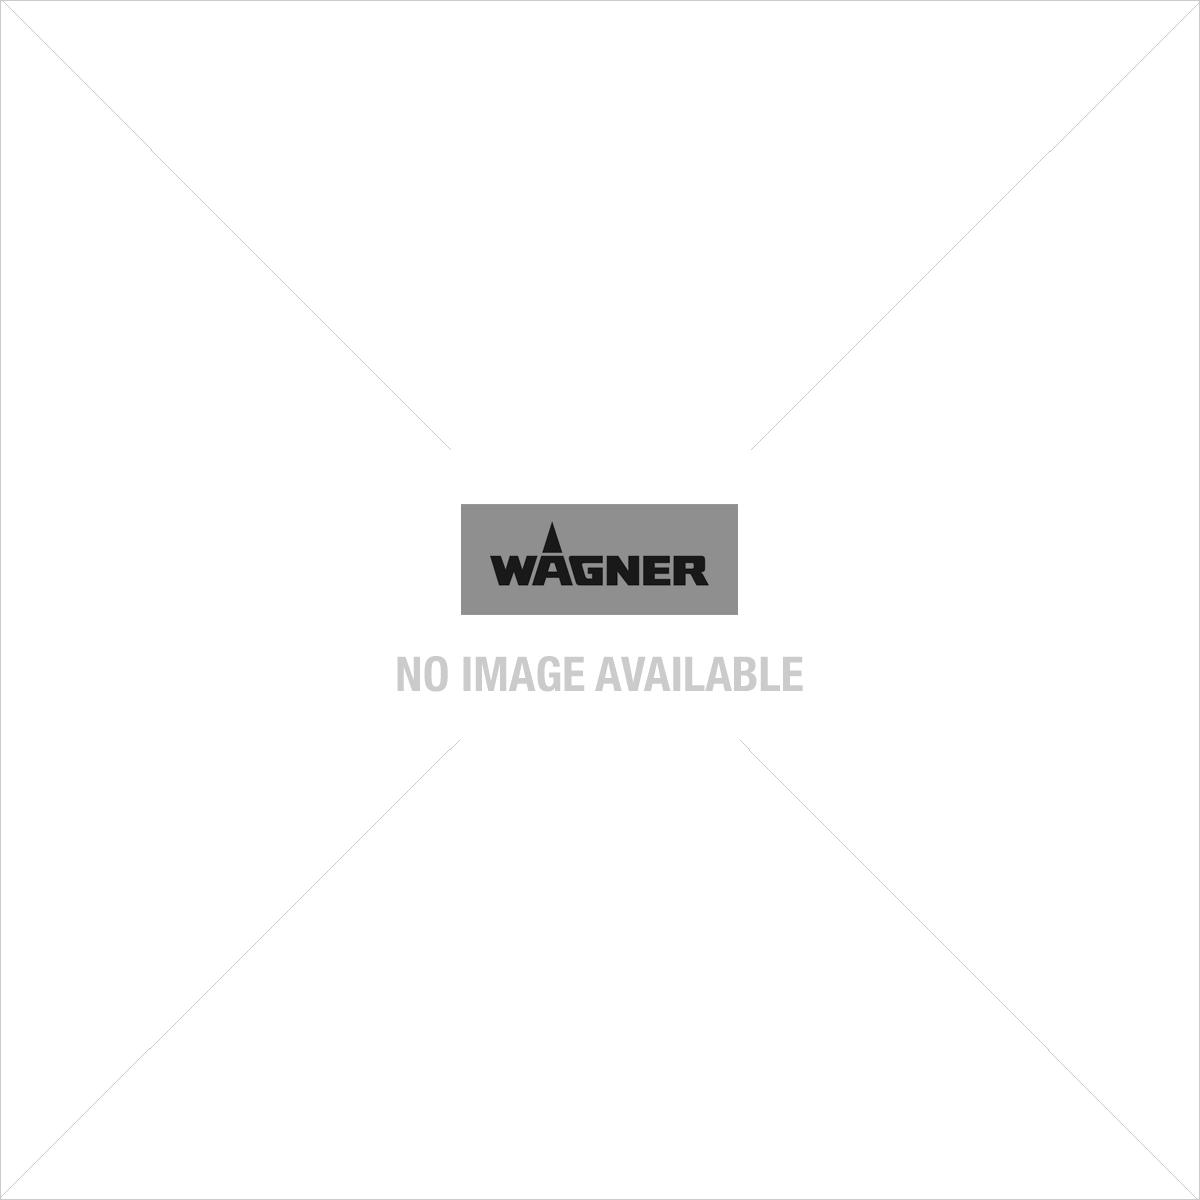 Wagner airless spuitpistool PP-05 met swivel P-serie